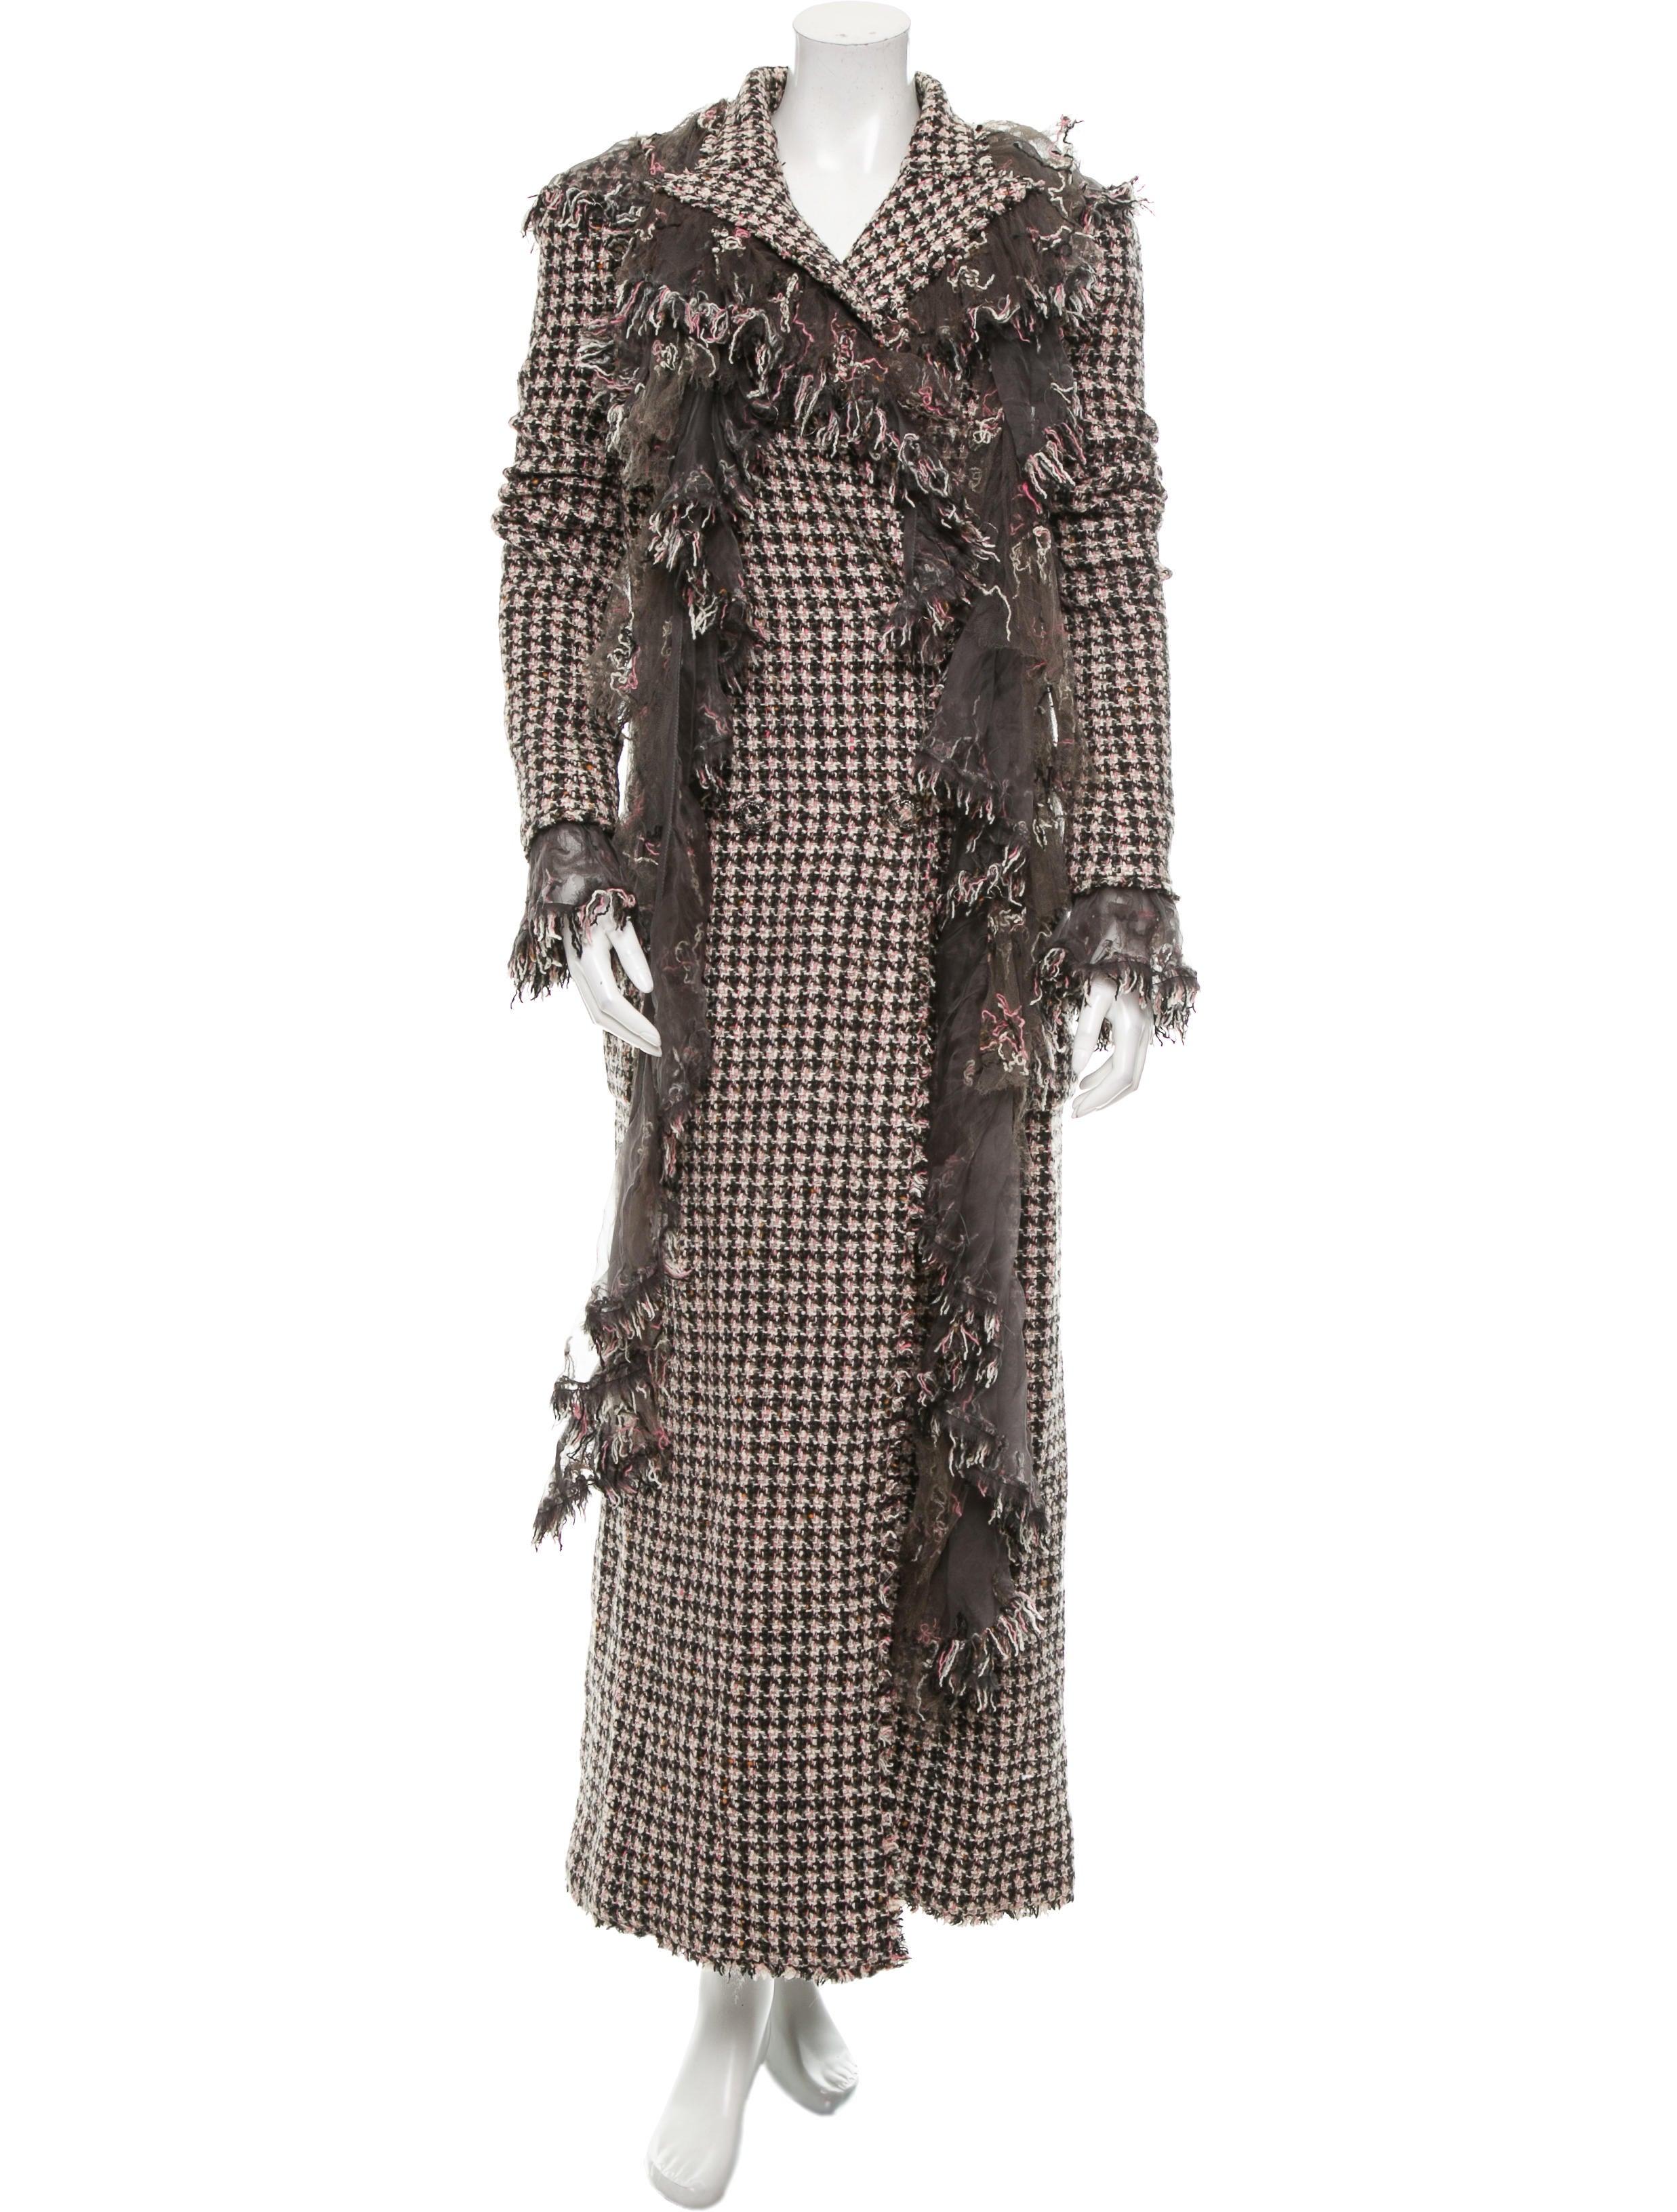 Chanel Wool Tweed Coat Clothing Cha142258 The Realreal